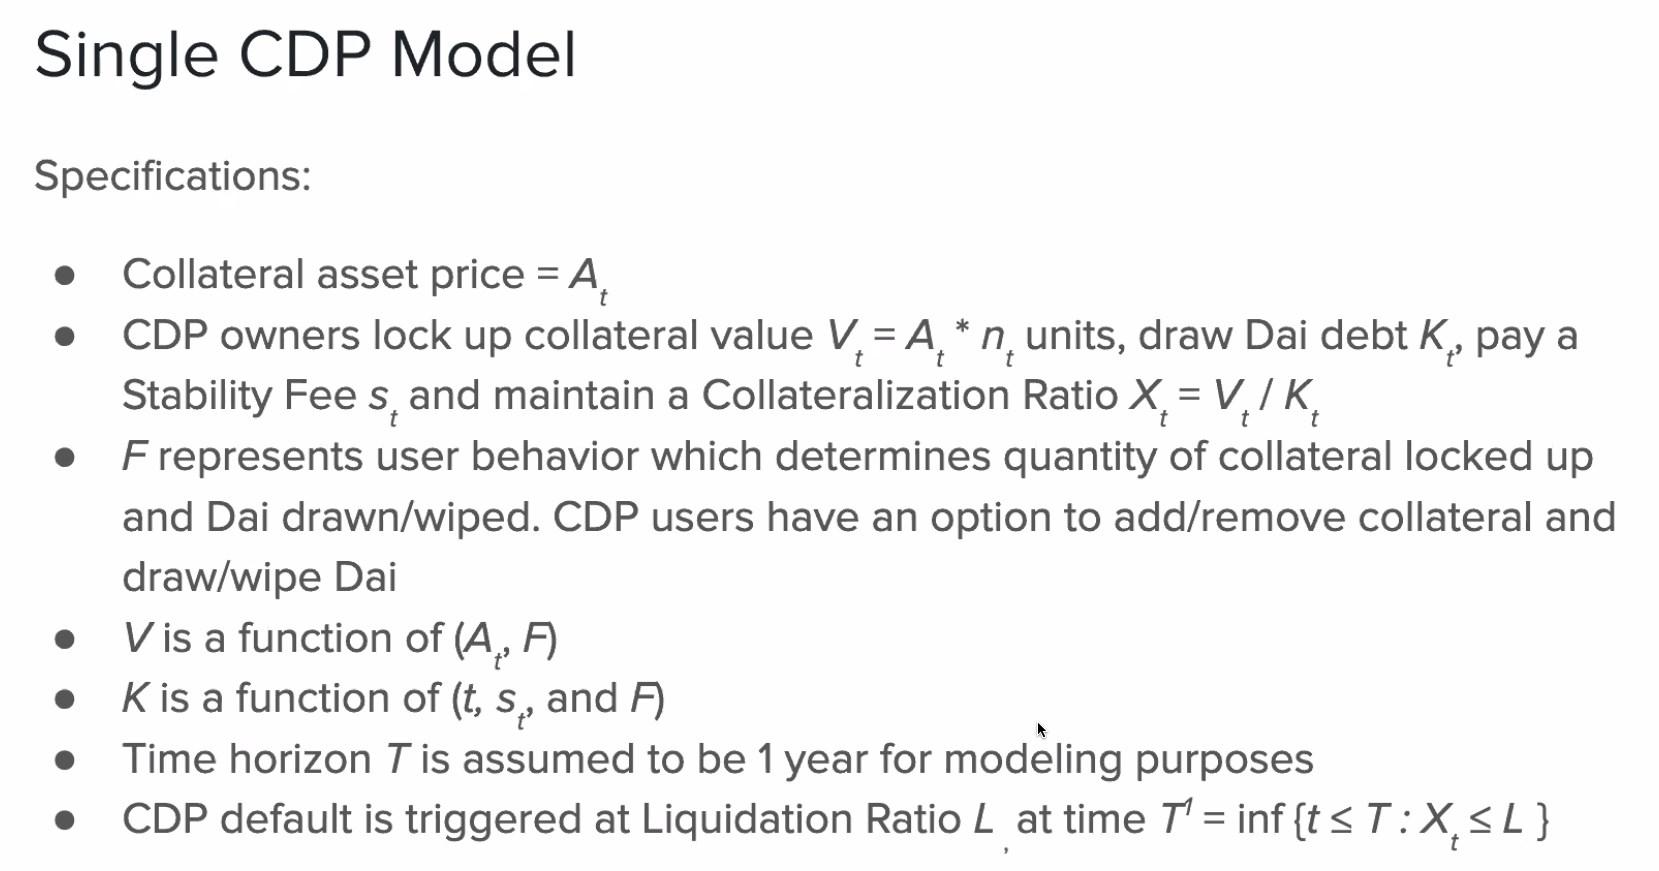 Single CDP Model 1